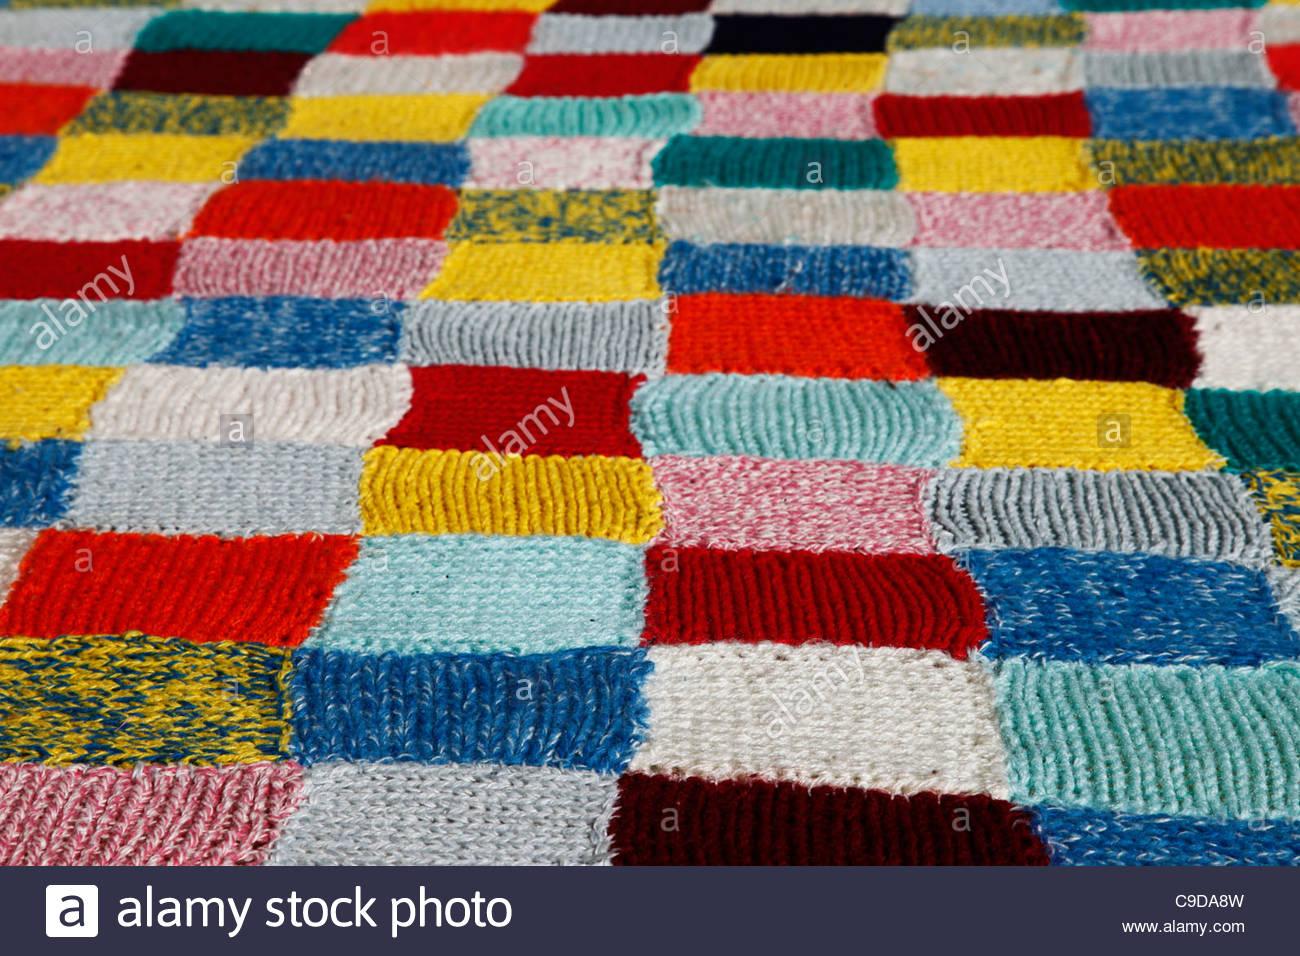 wool blanket - Stock Image